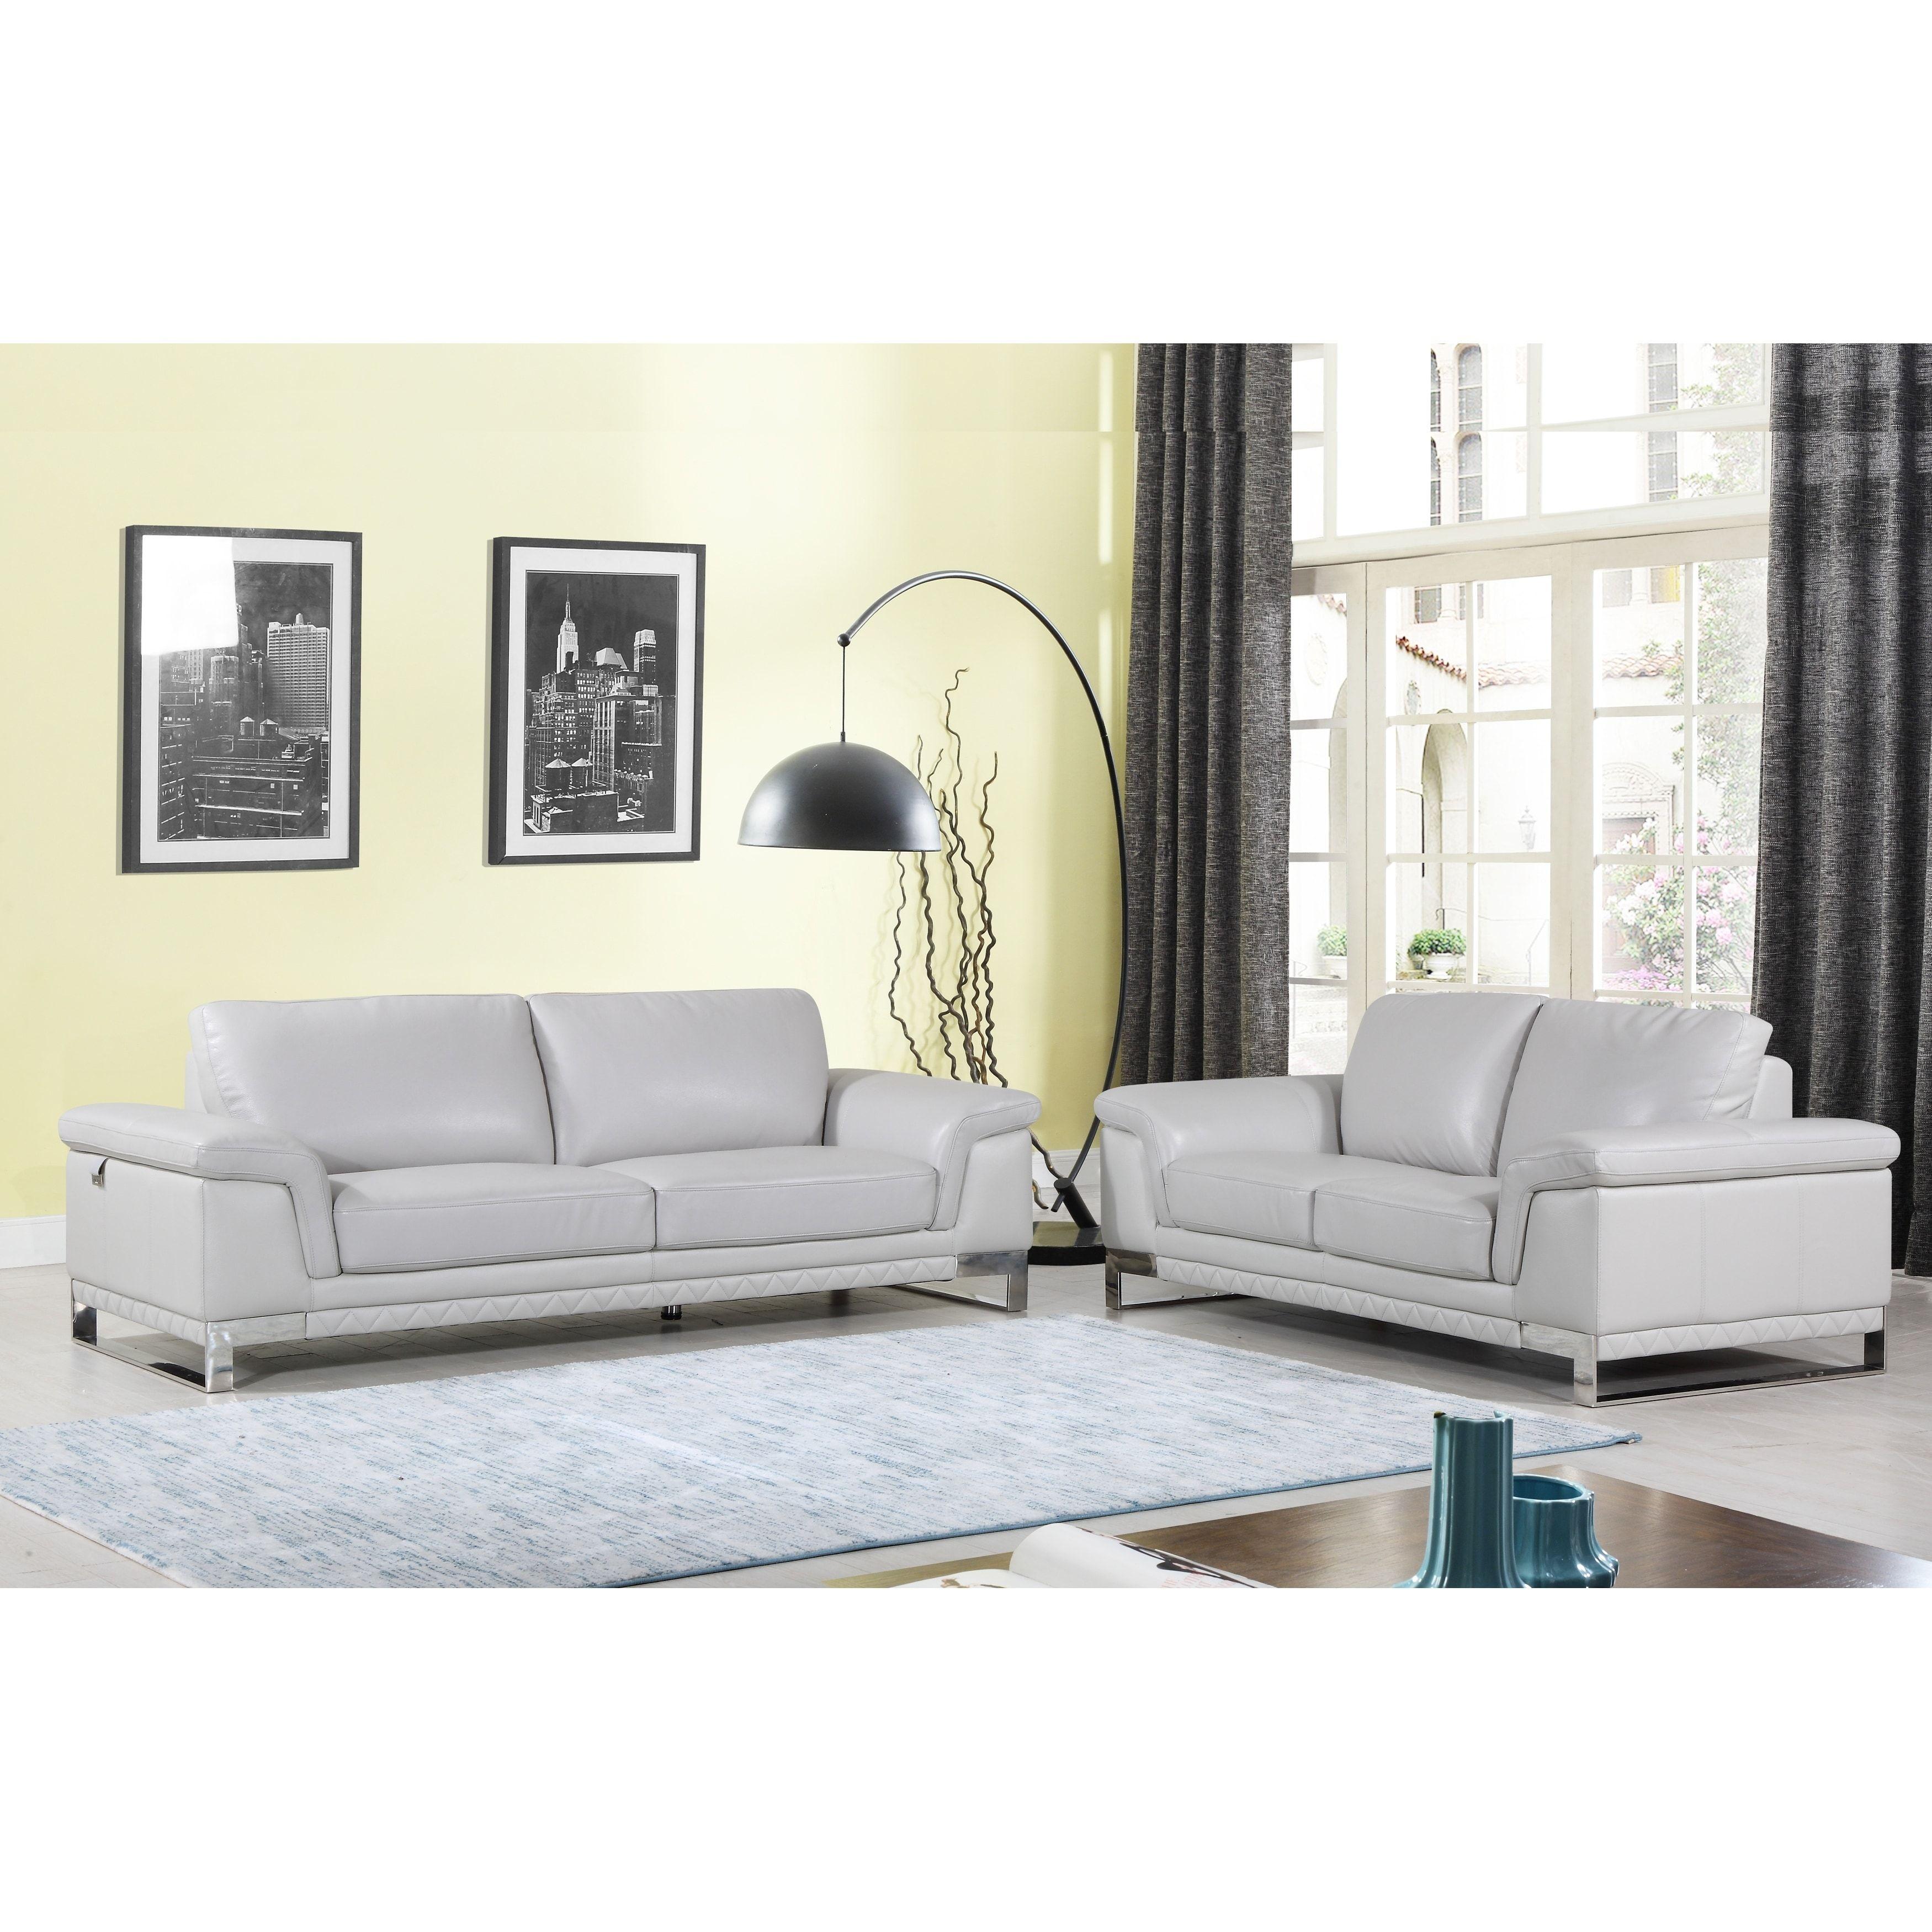 DivanItalia Arezzo Luxury Italian Leather Upholstered 2-Piece Living ...